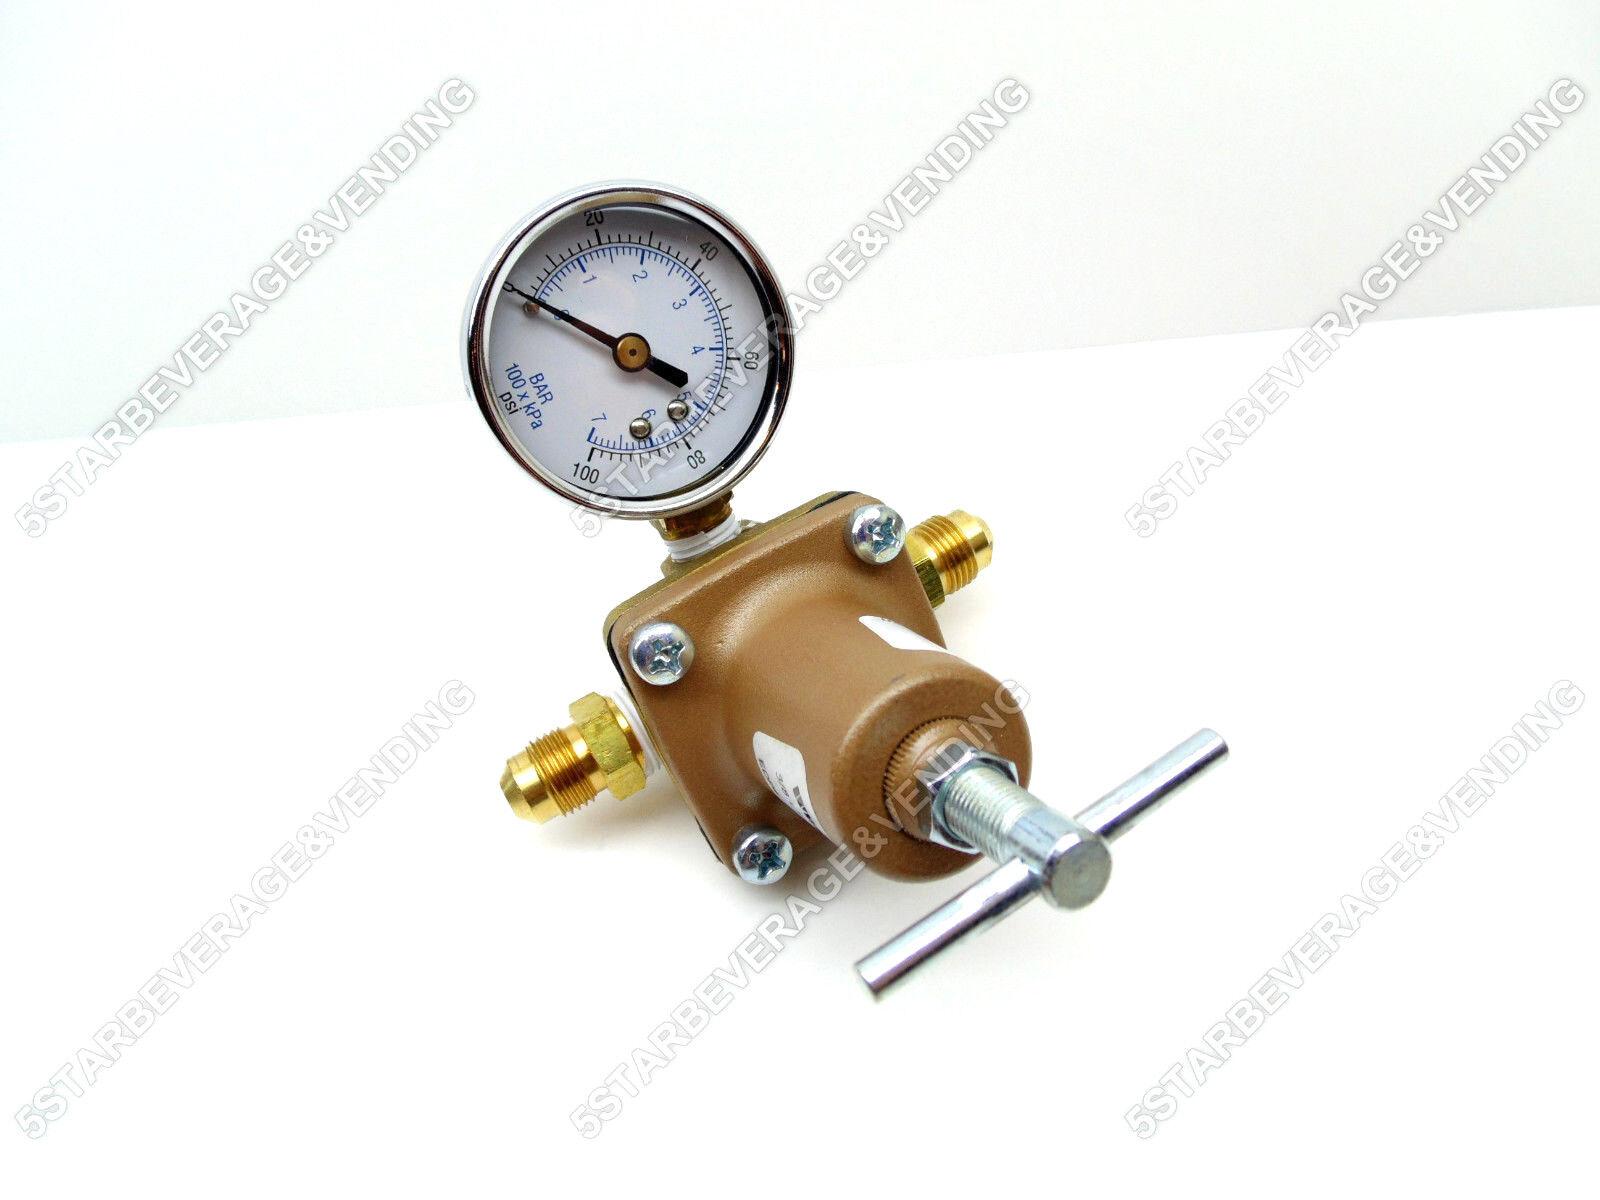 "WATTS LF263A 3/8"" 3-WAY WATER PRESSURE REGULATOR 10-125PSI N"